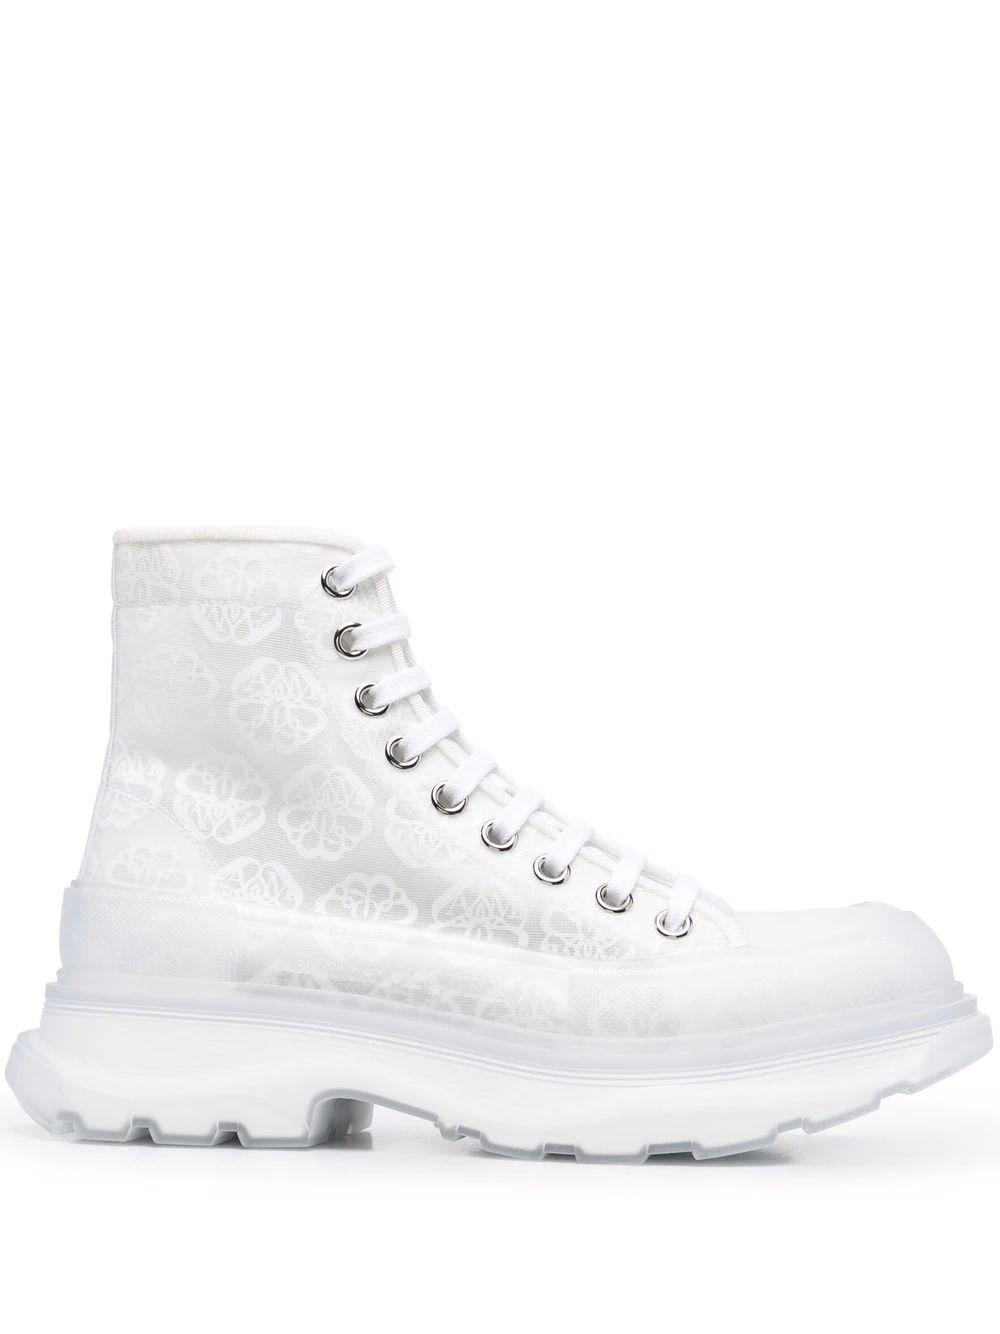 Chunky Combat Boot Item # 658086W4Q32